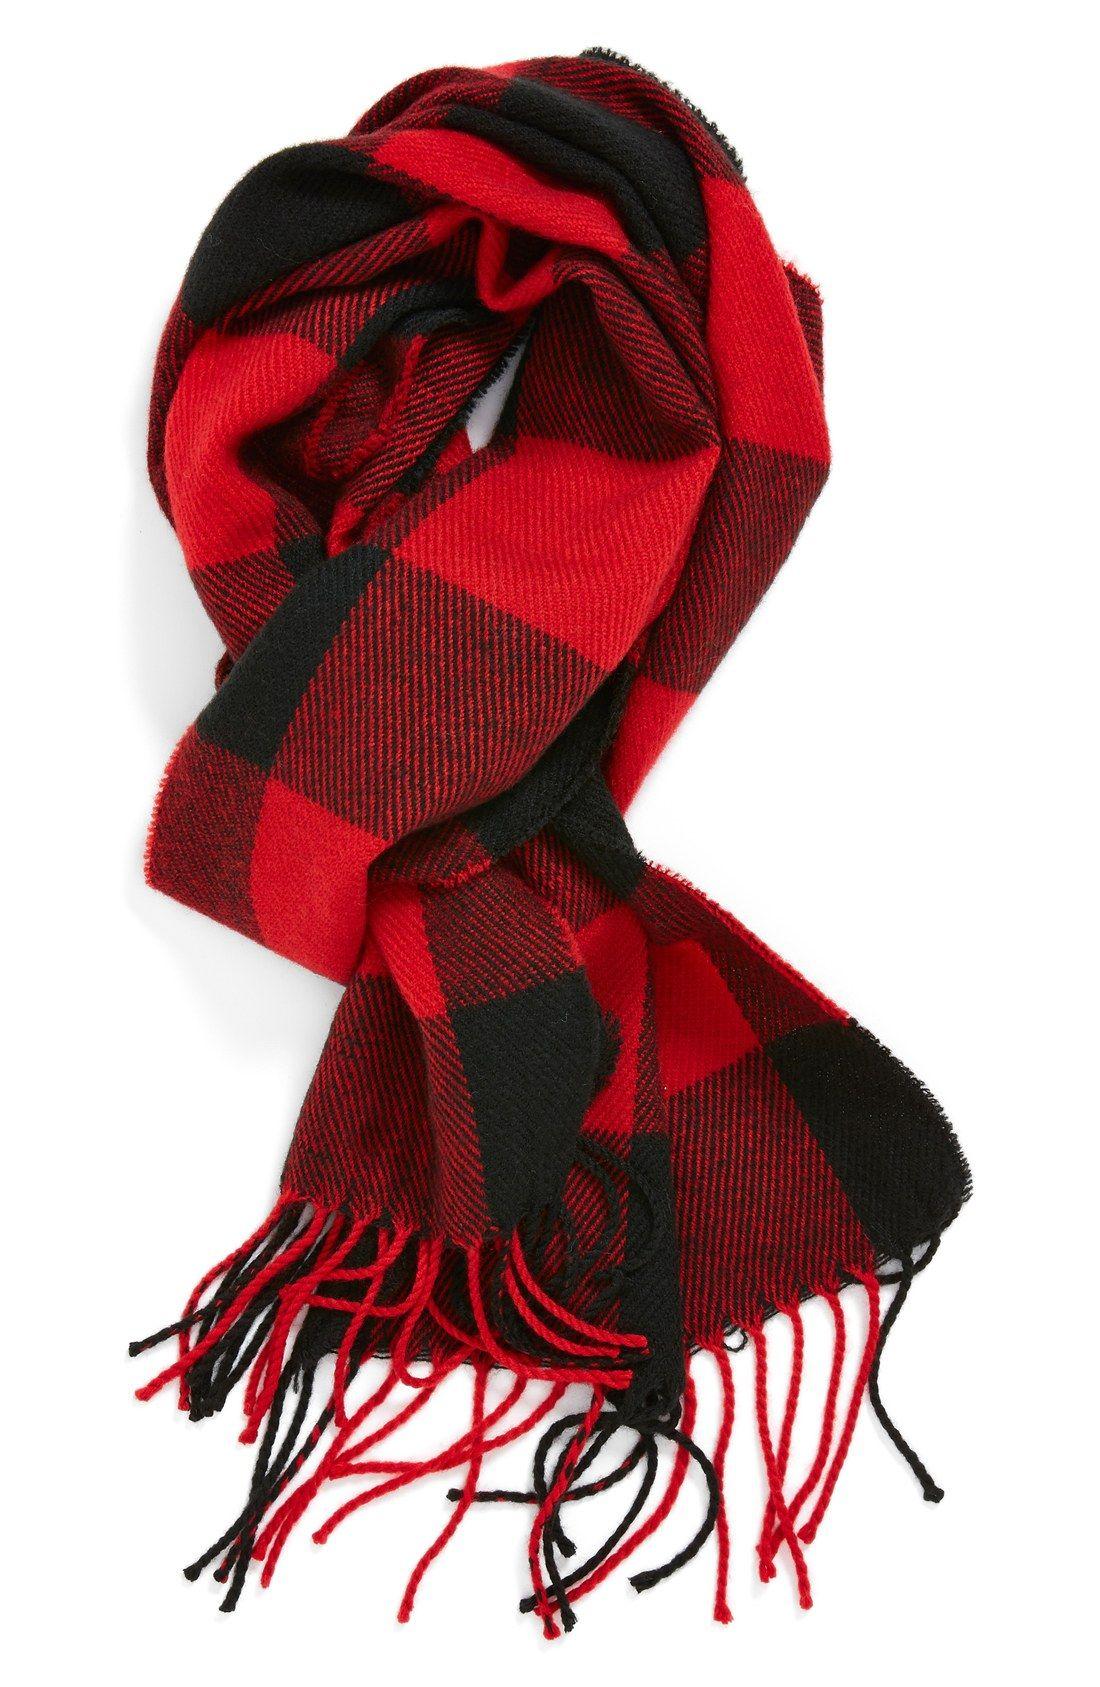 Sloggi Underwear Fall / Winter 2015 Lookbook | Fall winter 2015 ...